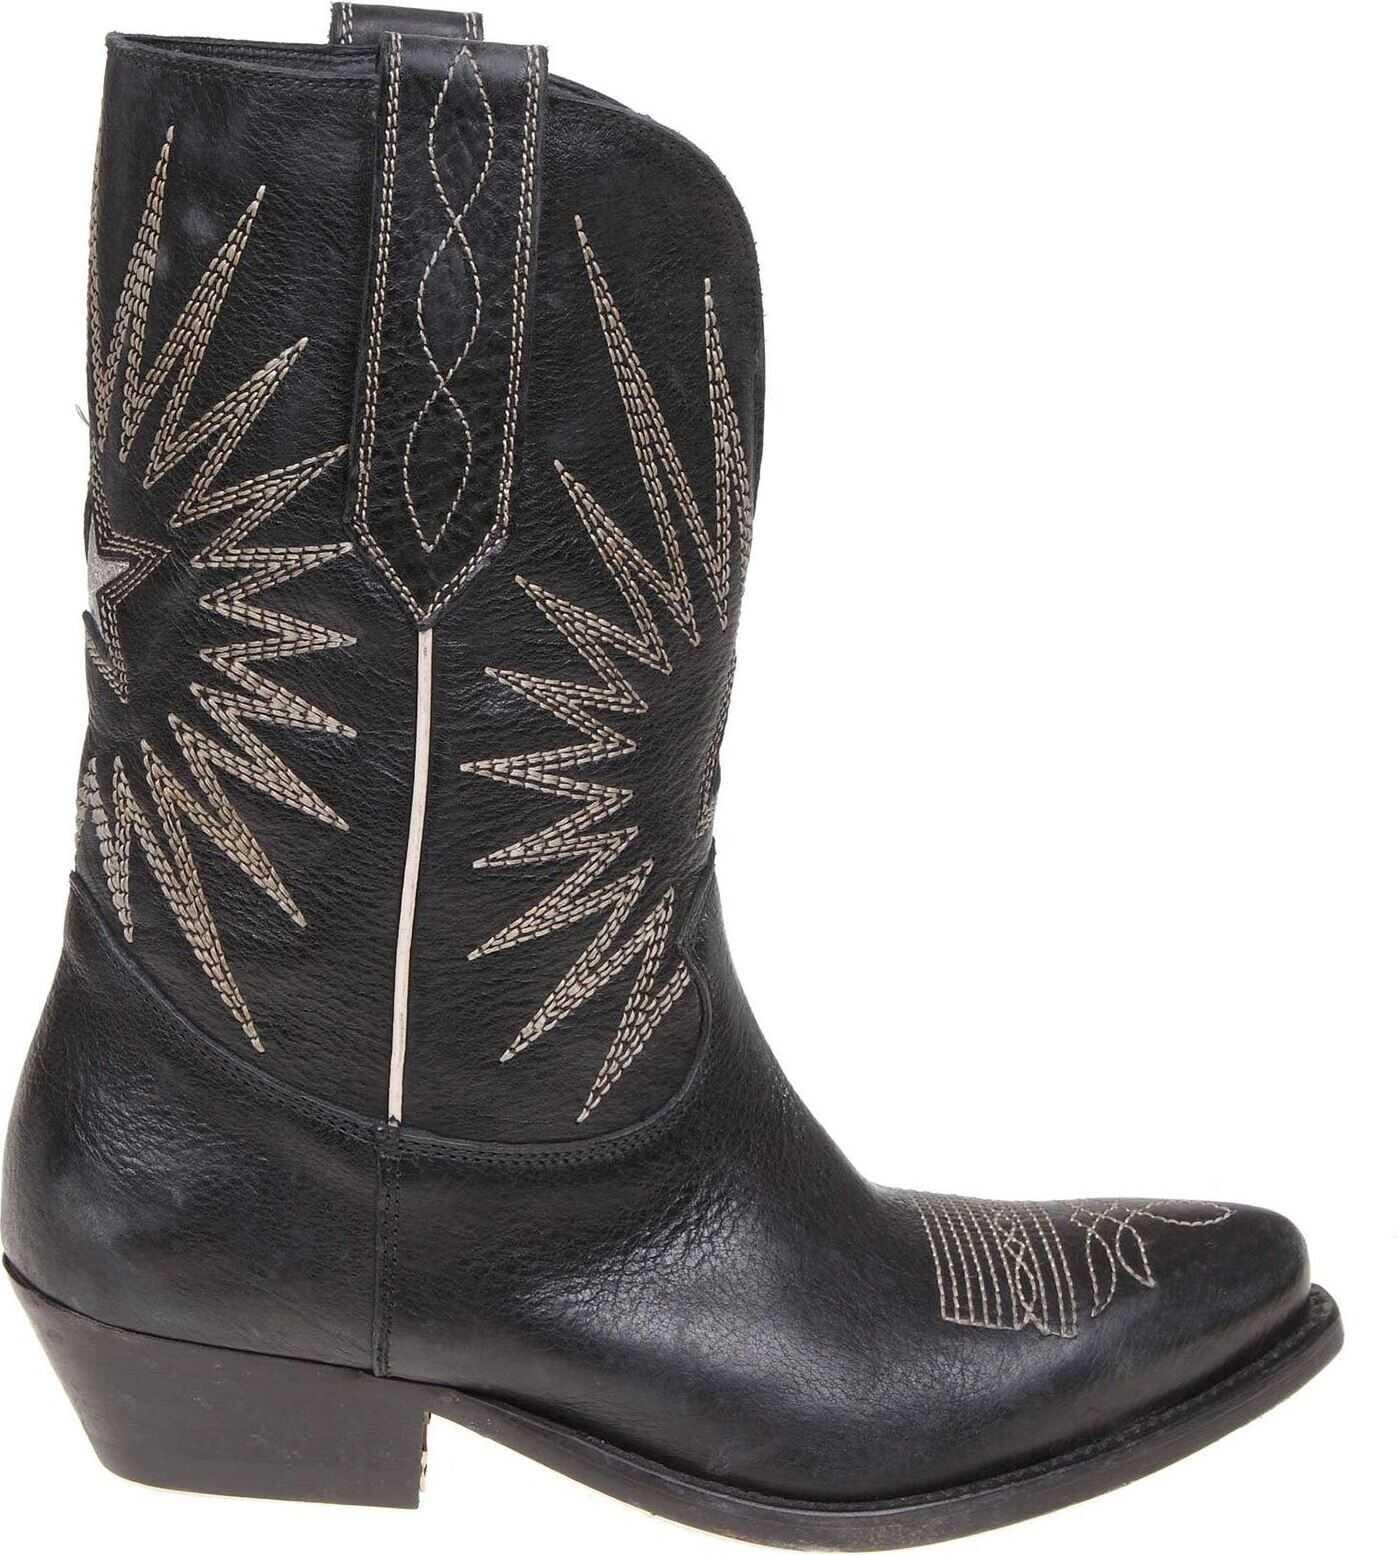 Golden Goose Black Wish Star Boots Black